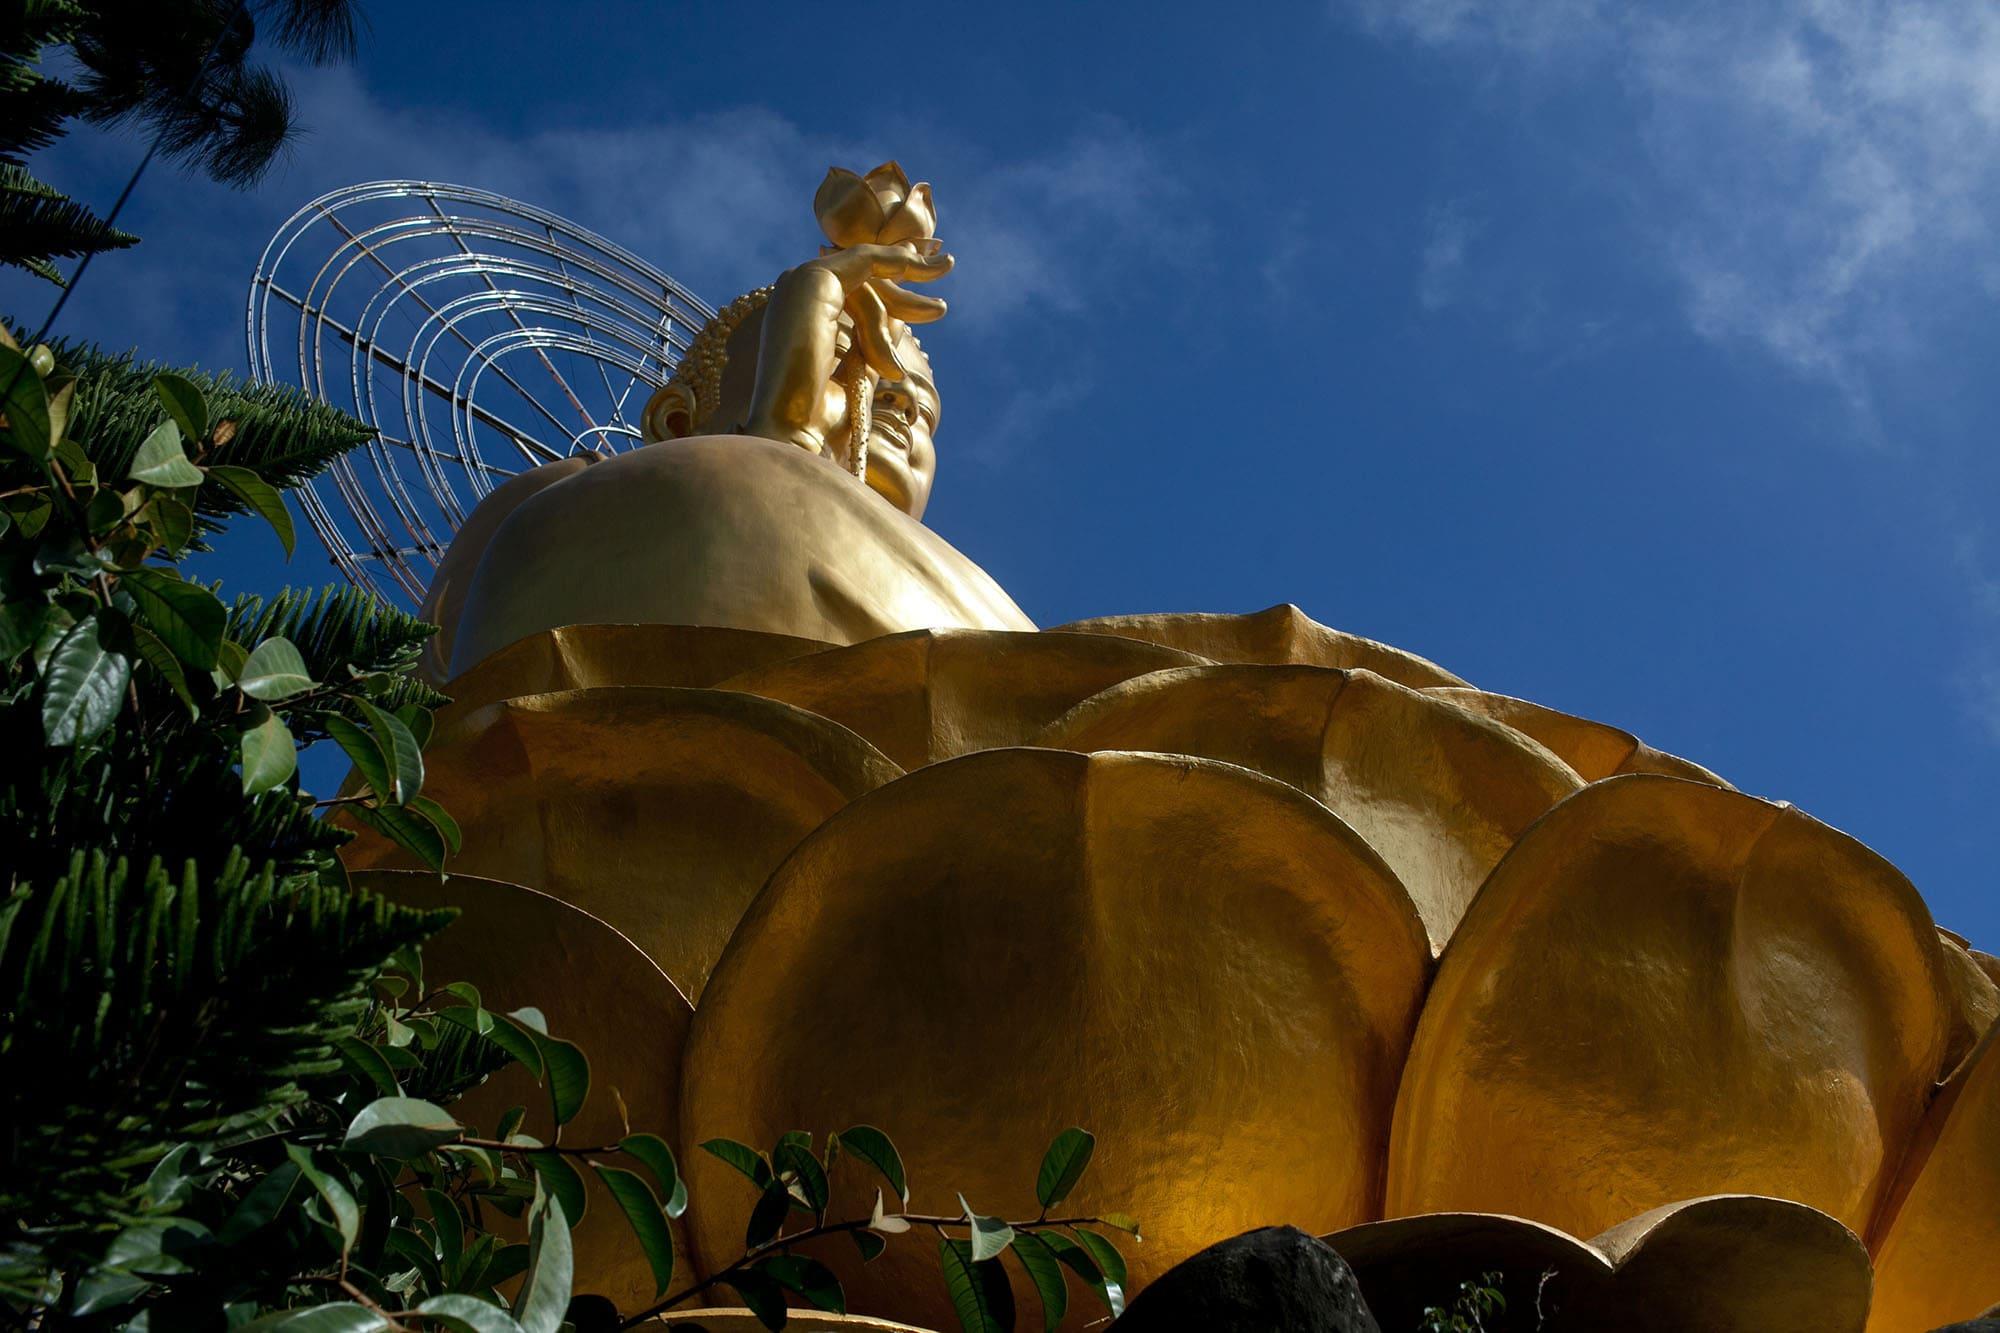 Giant Buddha in Dalat, Vietnam - Dalat Countryside Tour in Vietnam